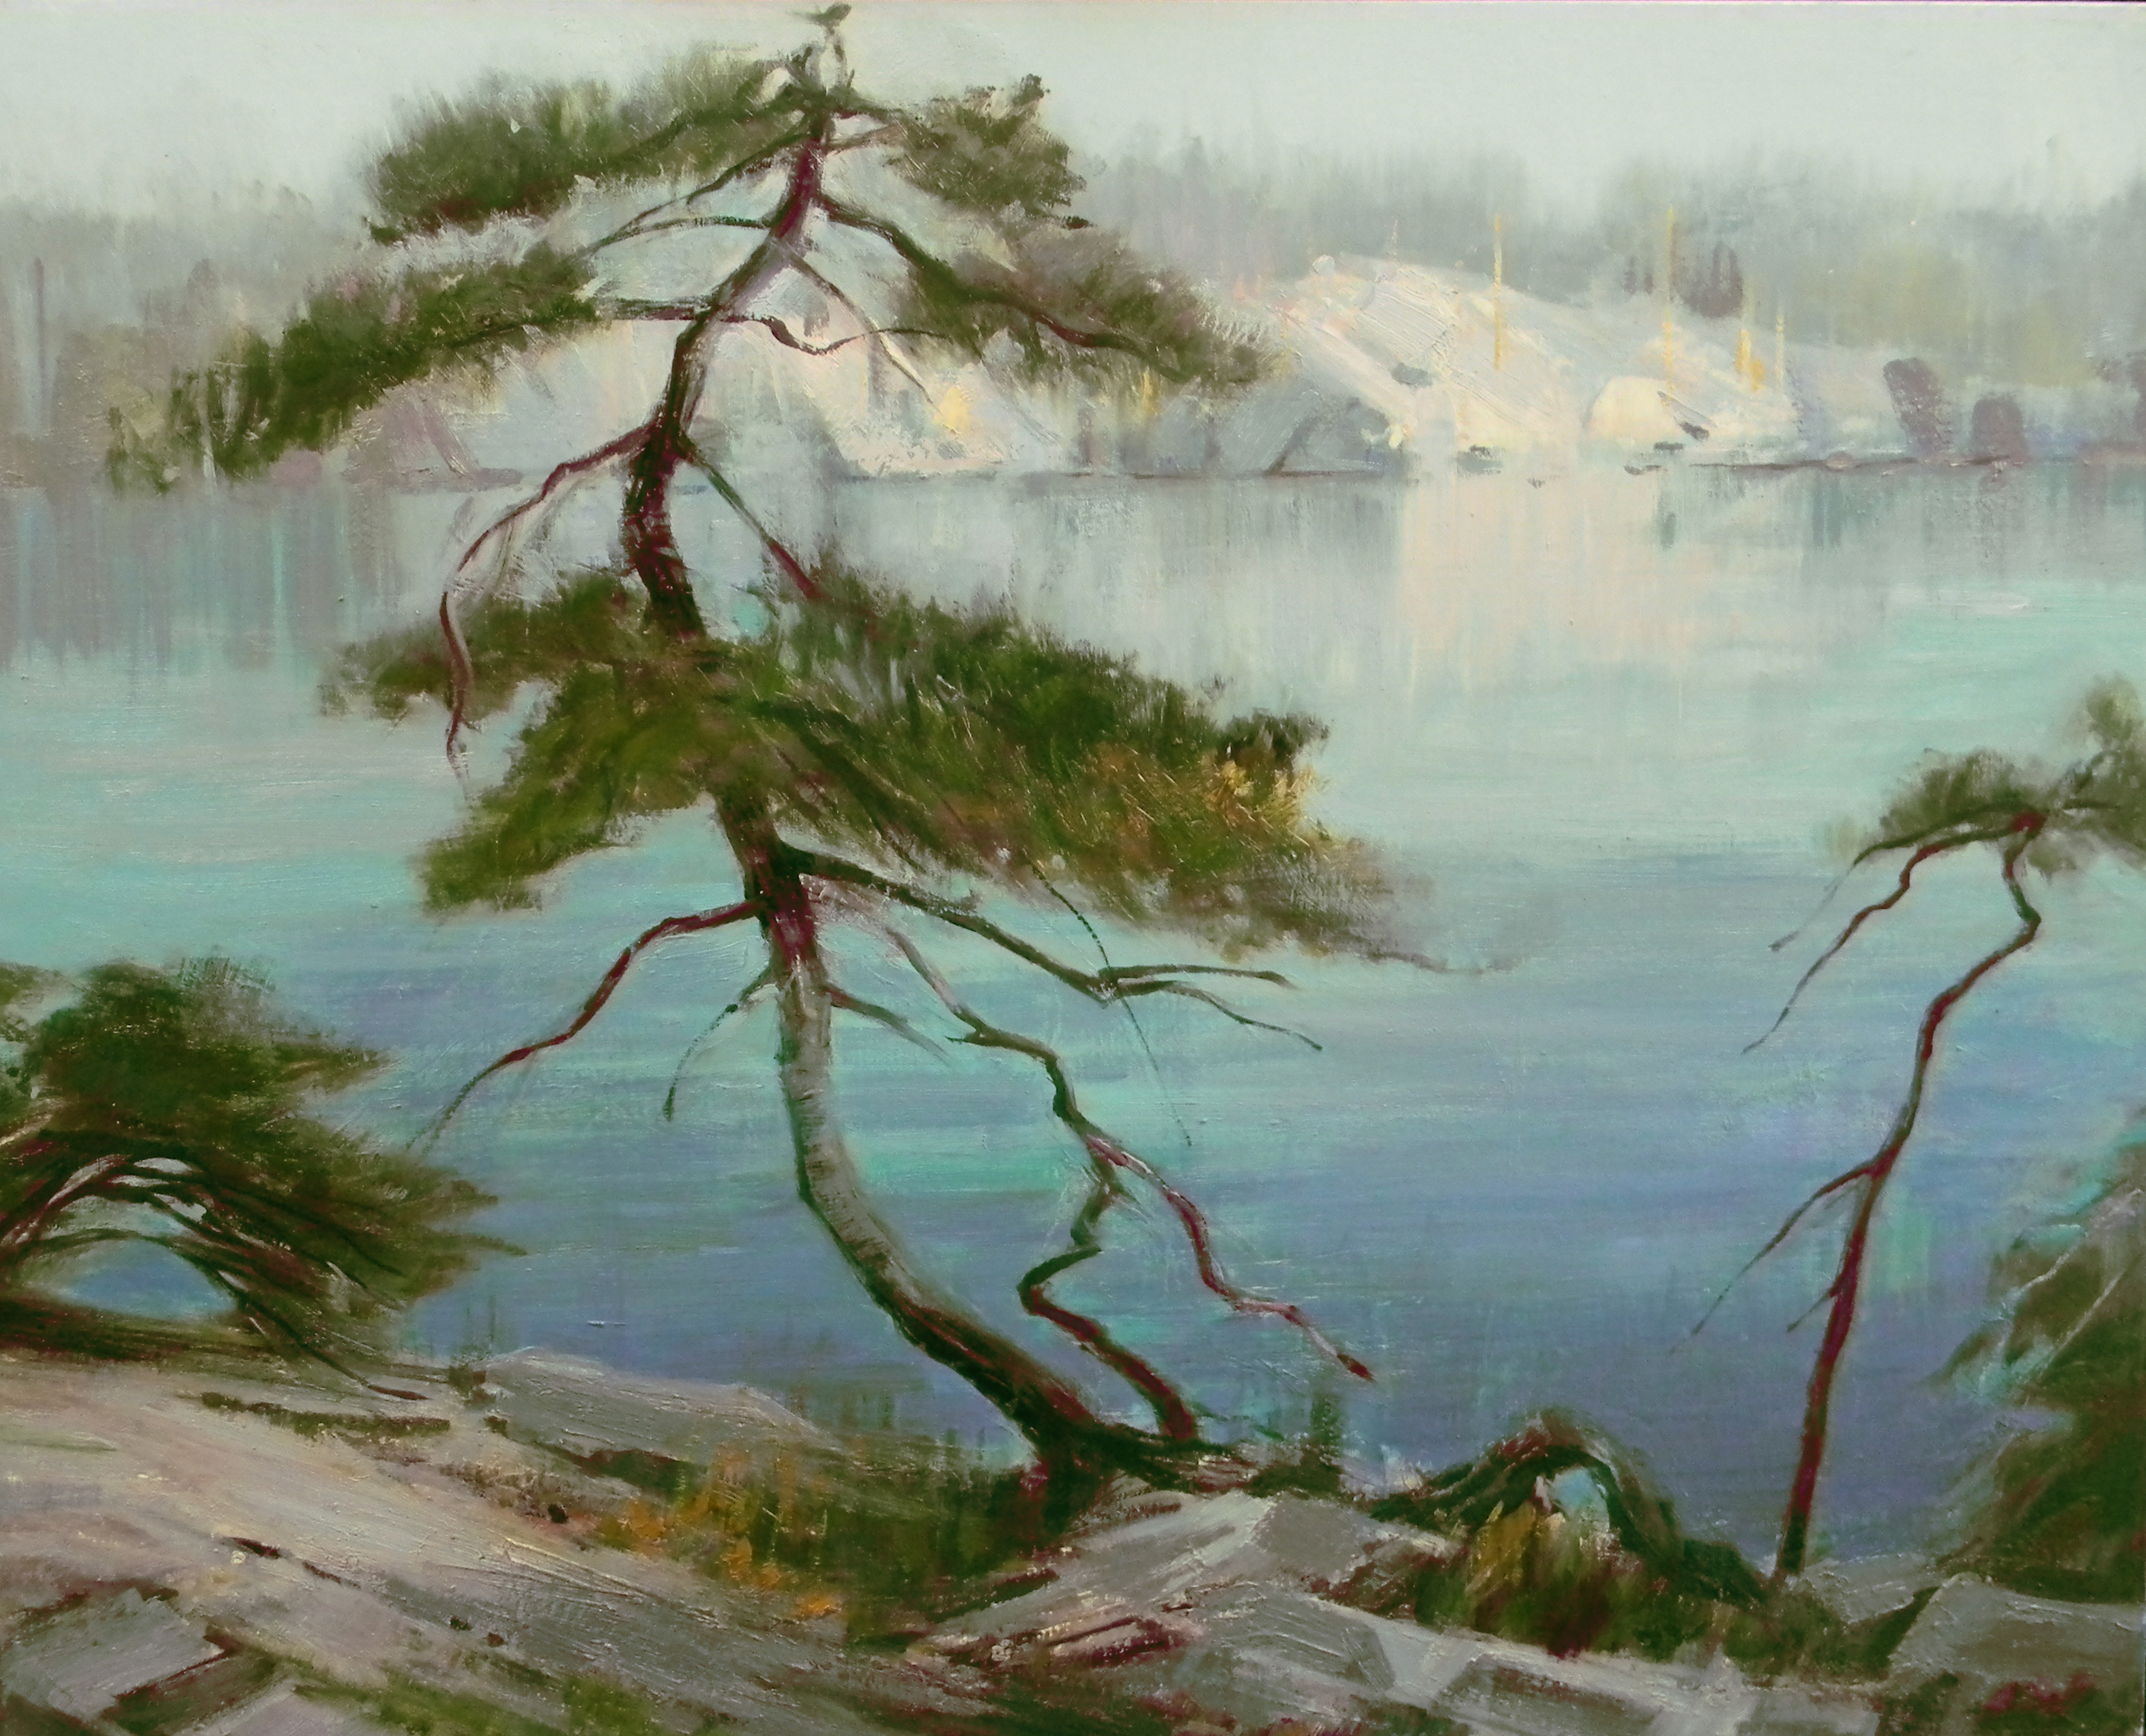 Jack Pine, A.Y. Jackson Lake, 6 am